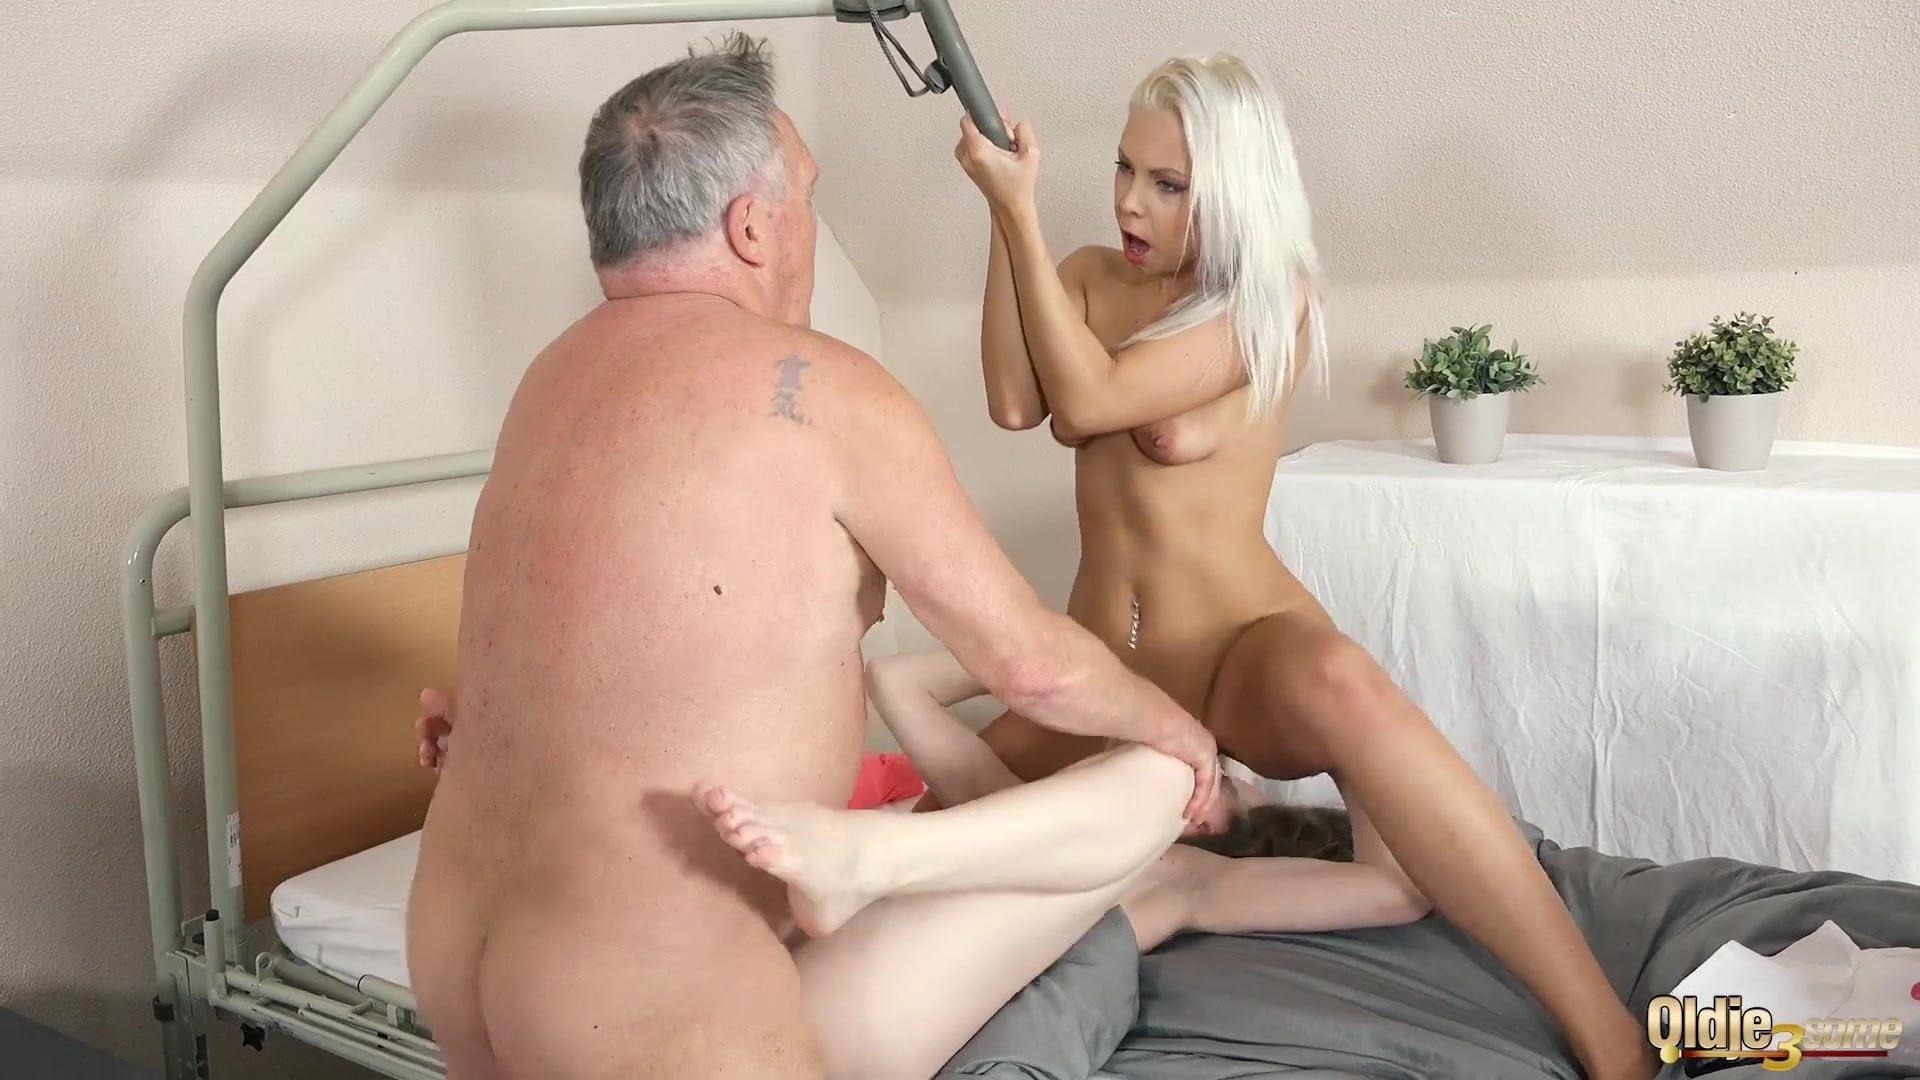 Wife catches husband fucking